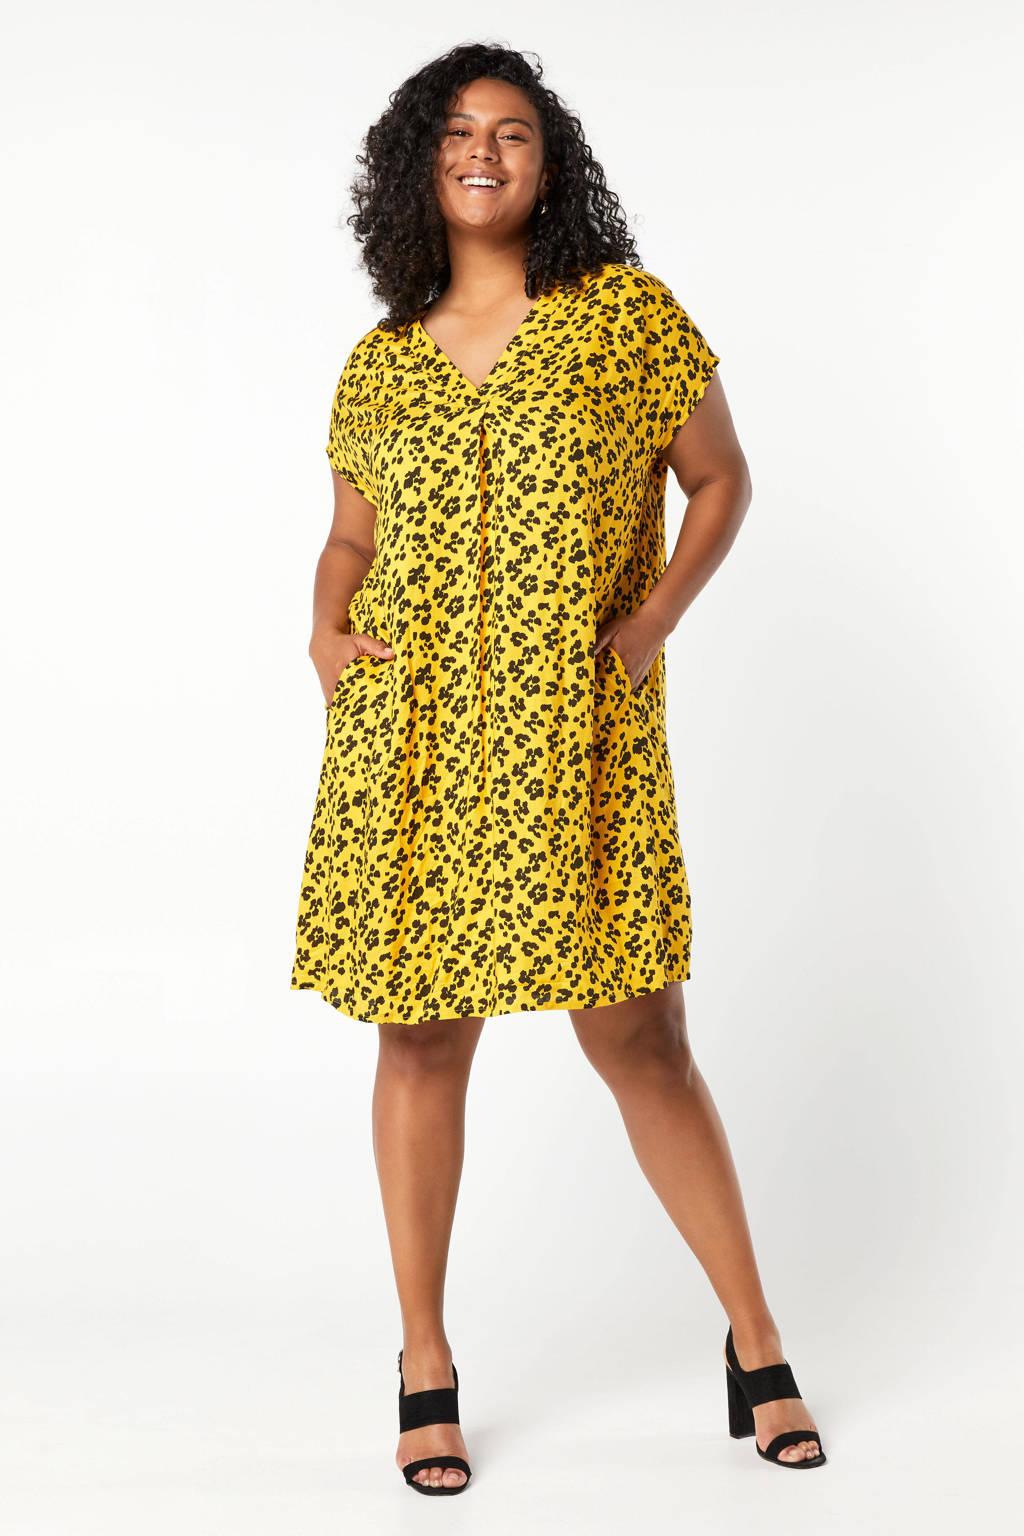 Miss Etam Plus blousejurk met panterprint geel/zwart, Geel/zwart